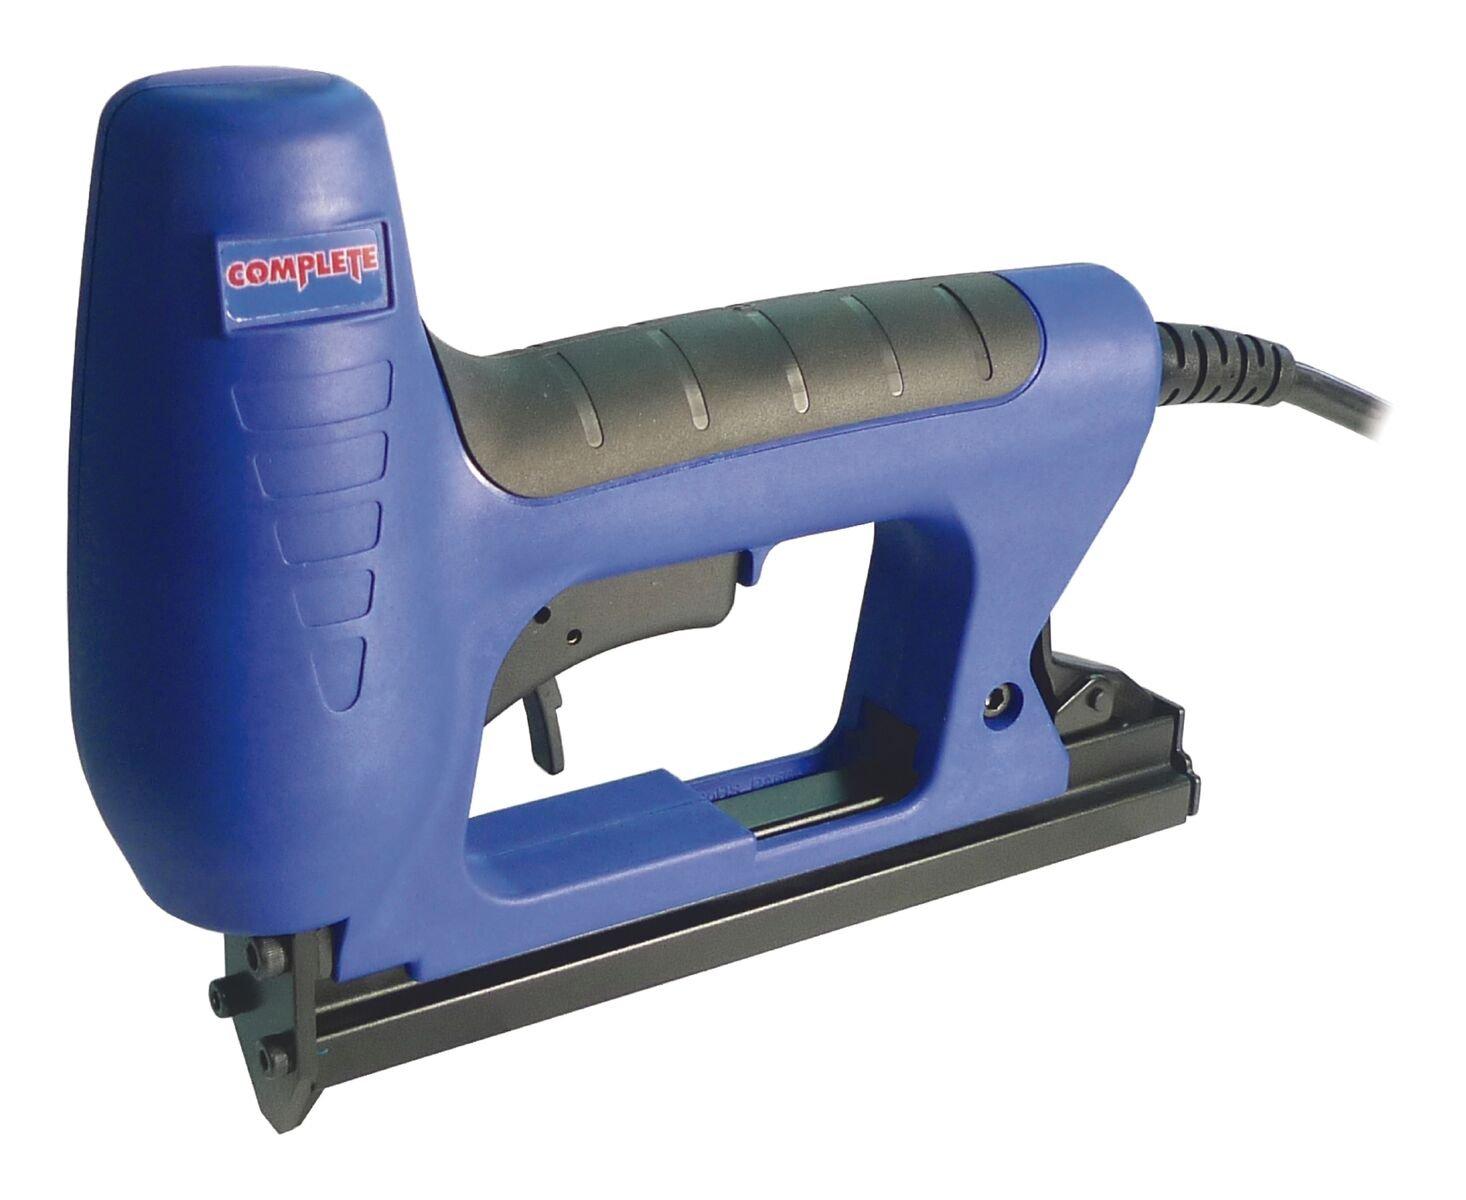 Complete C-E54//16 ProGrade Electric Carpet Stapler 3//16 Crown 5400 5418D SIMILAR TO CarpetPro ENC-5418A 1016055 PTACK54E PP5418 DF-54 6063110